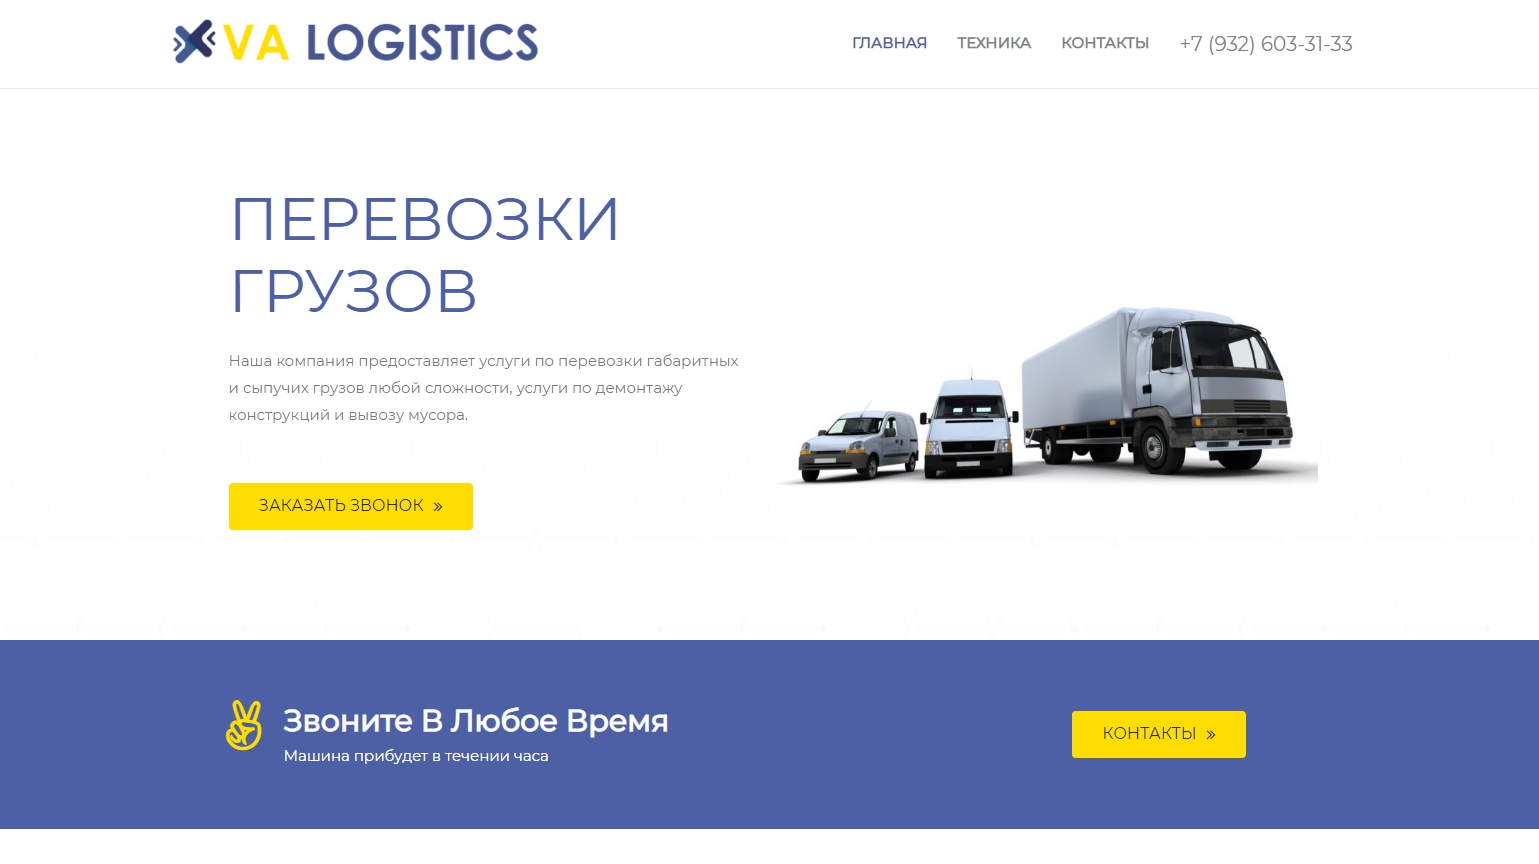 Корпоративный сайт компании грузоперевозок VA LOGISTICS